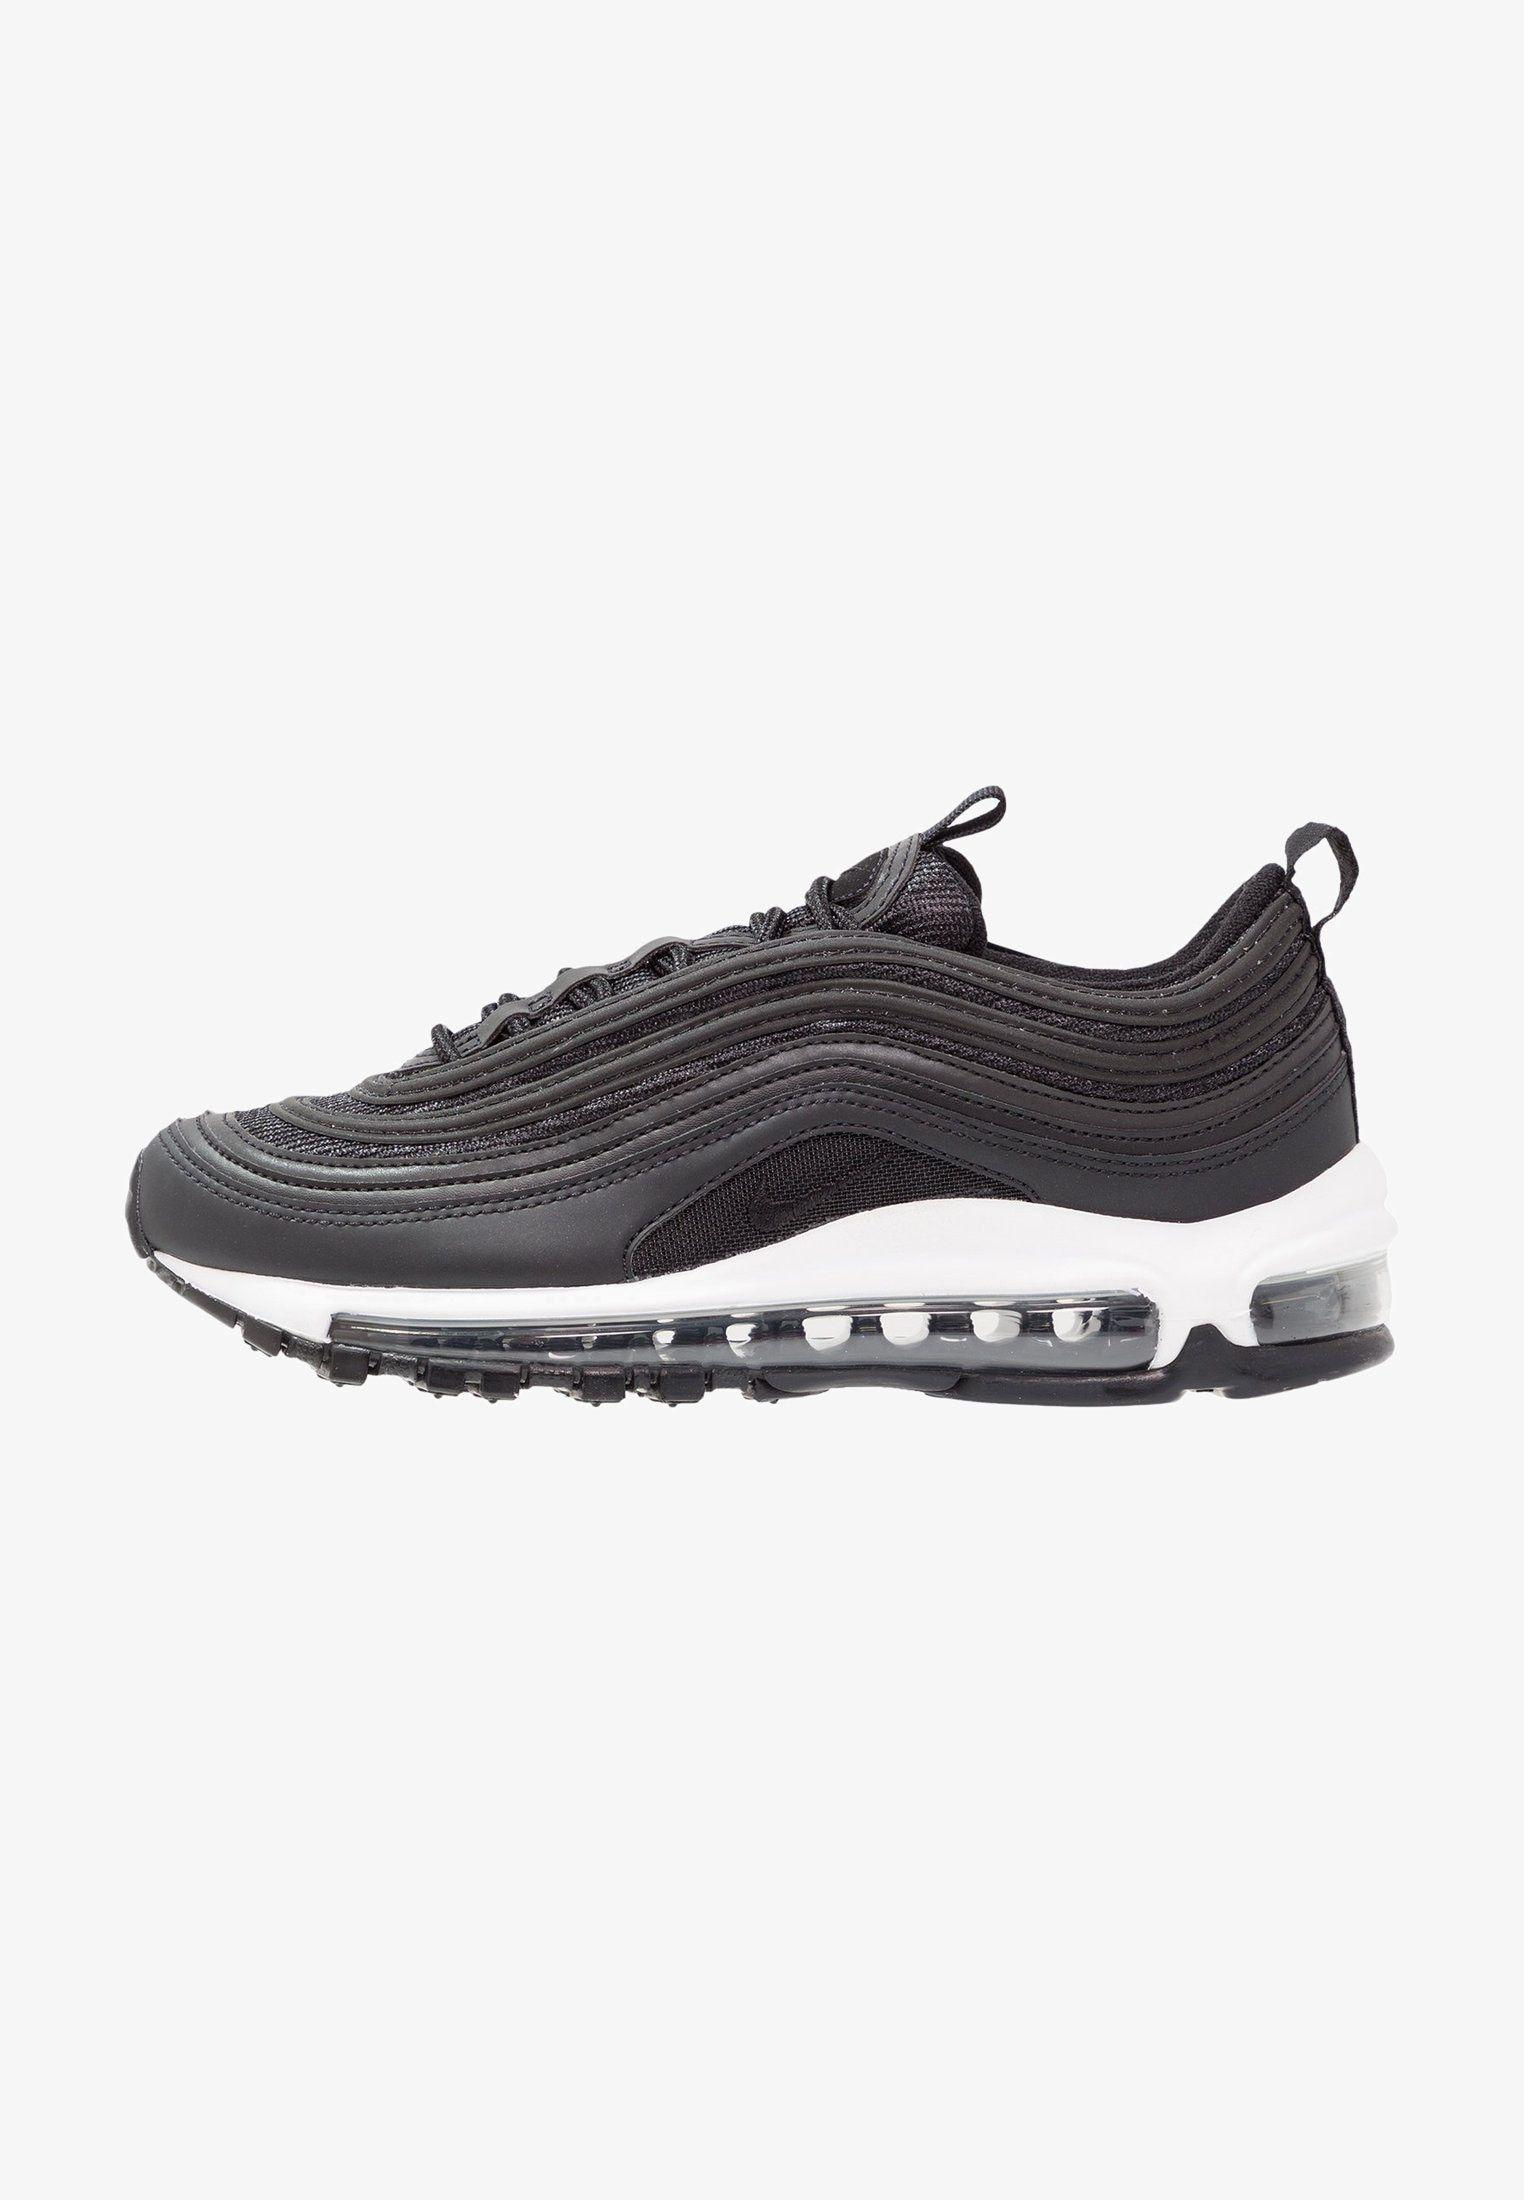 online store d6d01 66c56 Nike Sportswear NIKE AIR MAX 97 - Sneakers - black dark grey - Zalando.